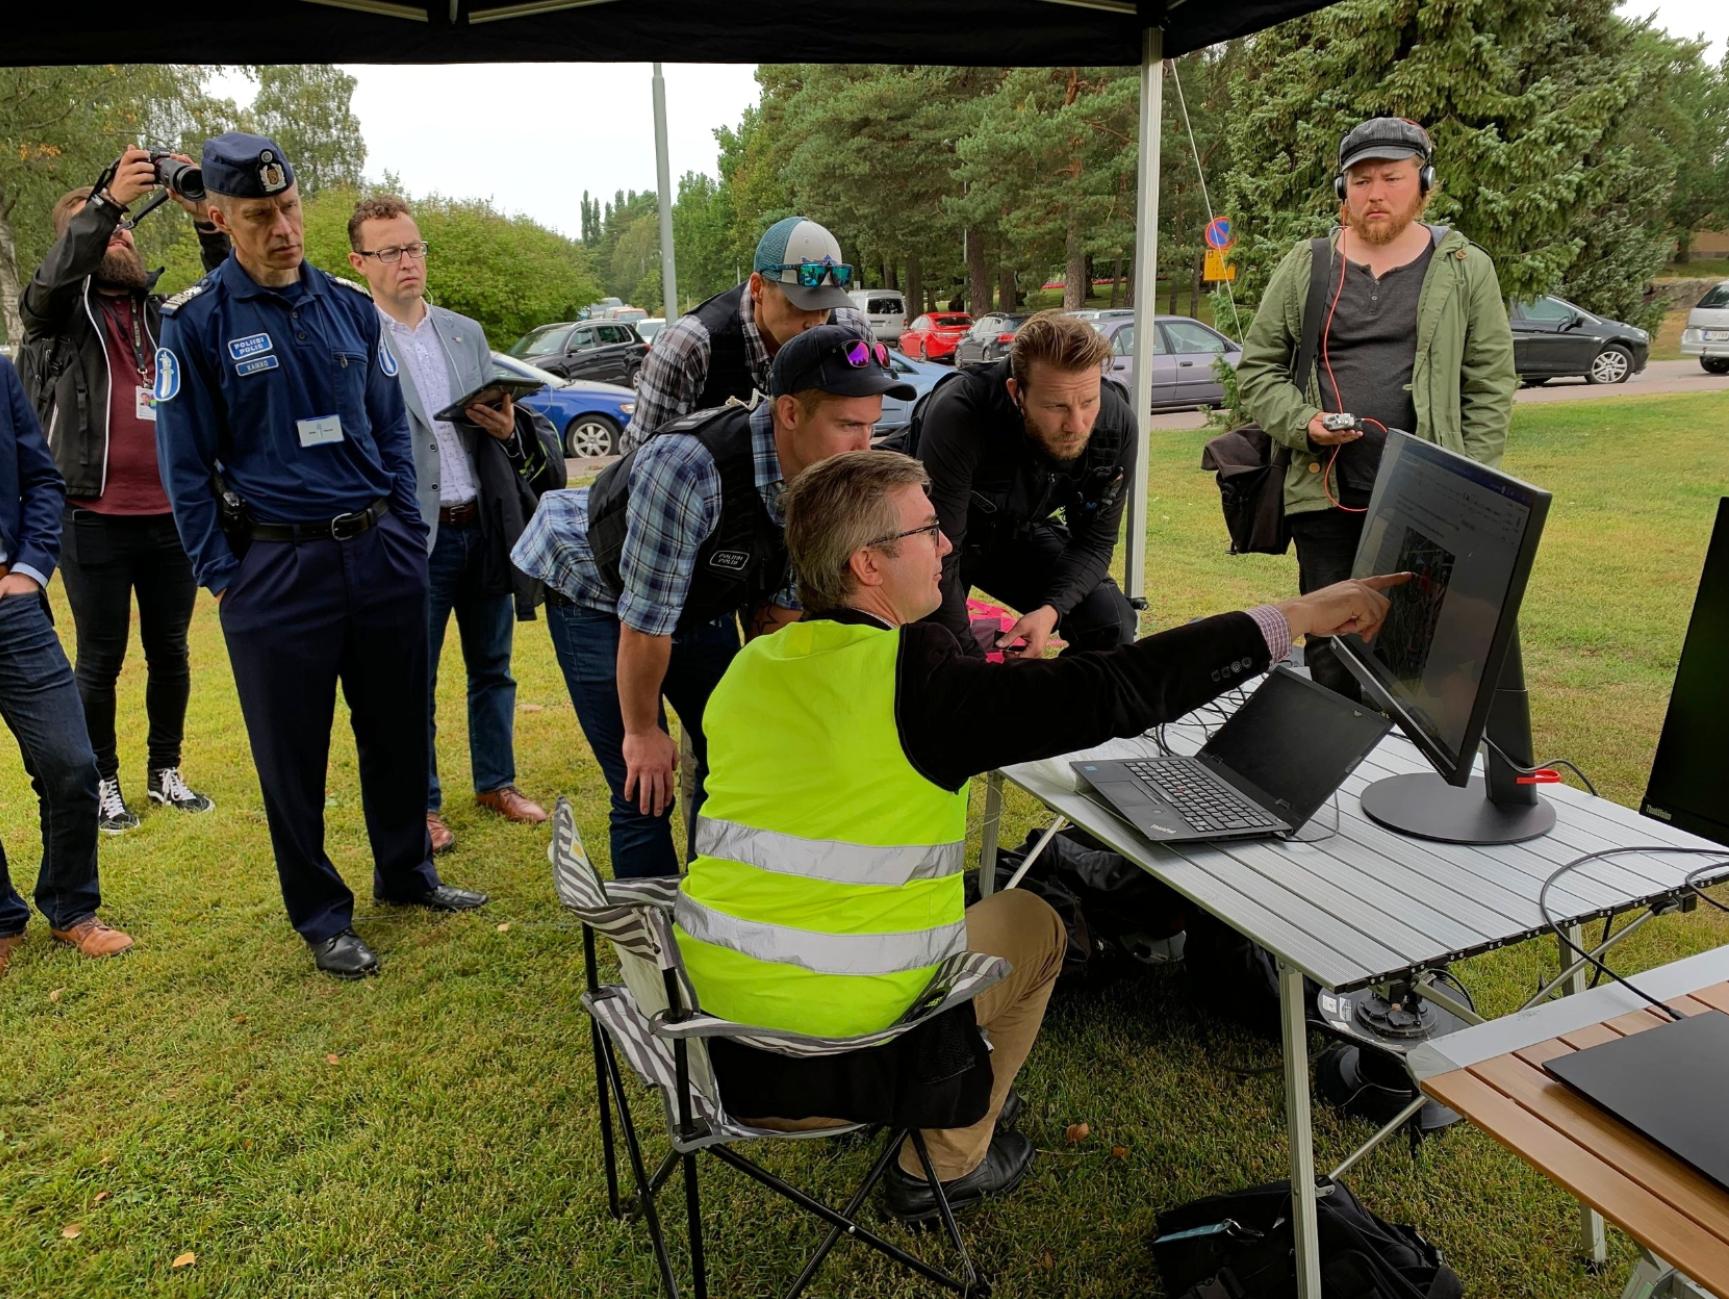 2019-09-24 17_11_12-Fleetonomy make UAV History at SESAR GOF U-SPACE Trials — Fleetonomy.ai.png